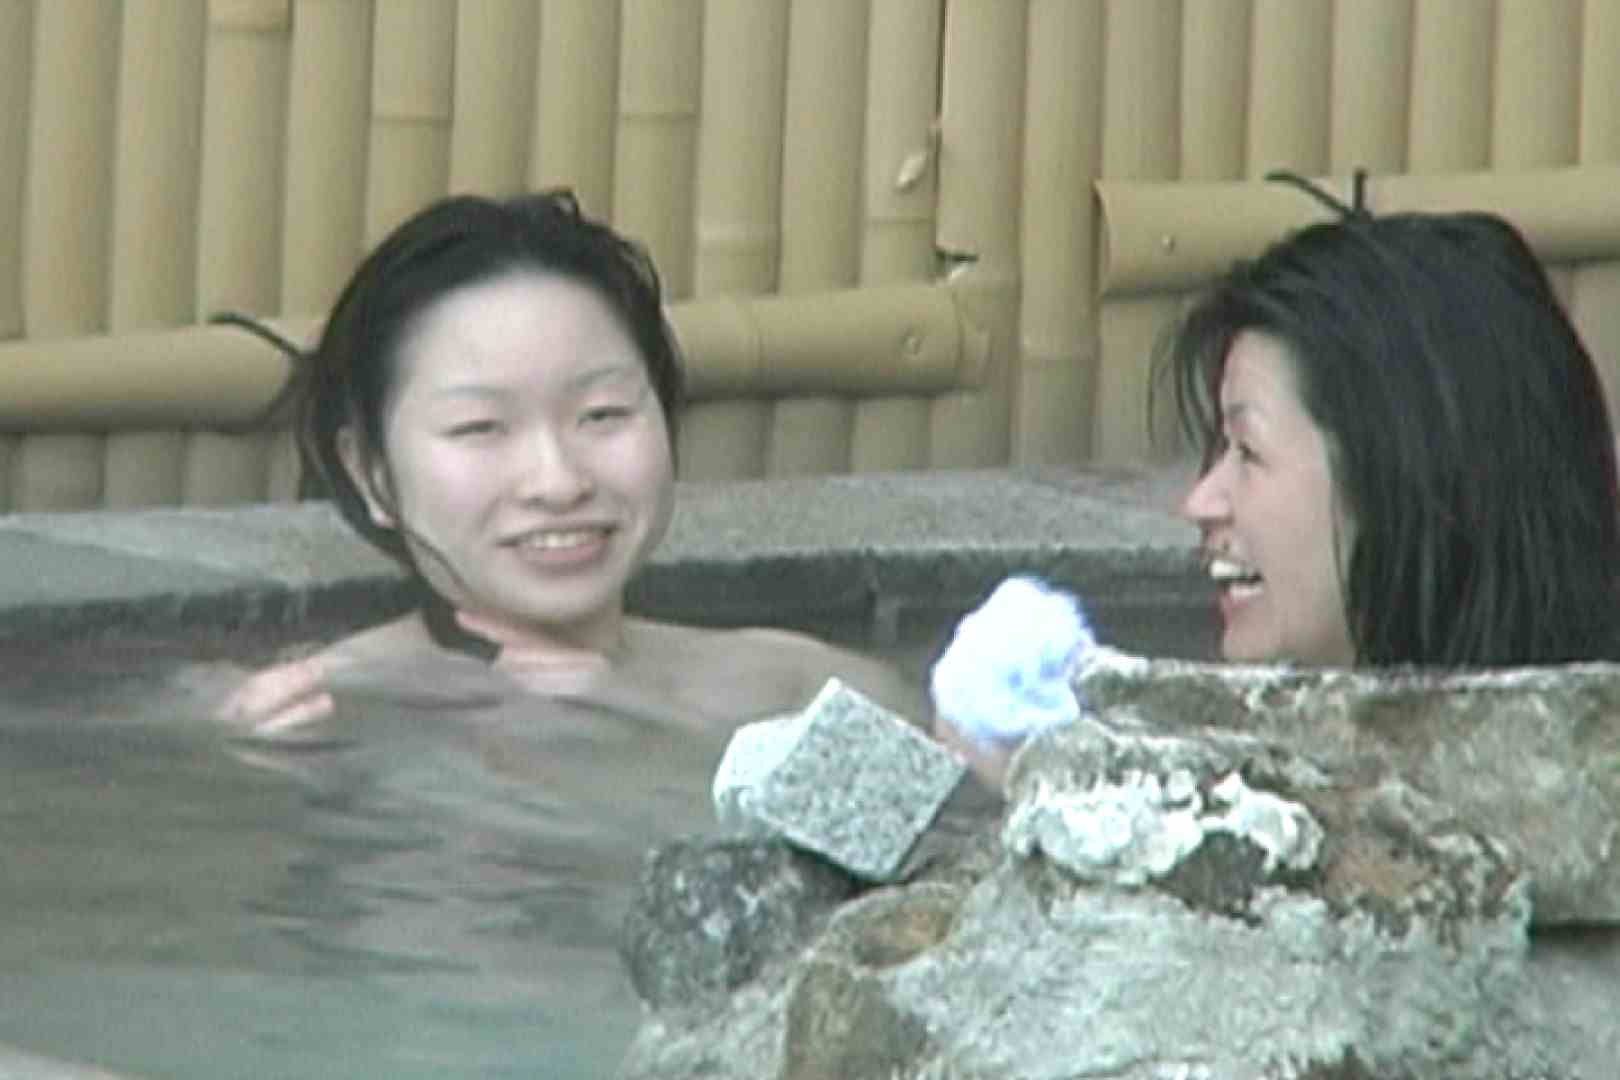 Aquaな露天風呂Vol.595 綺麗なOLたち エロ無料画像 112枚 89